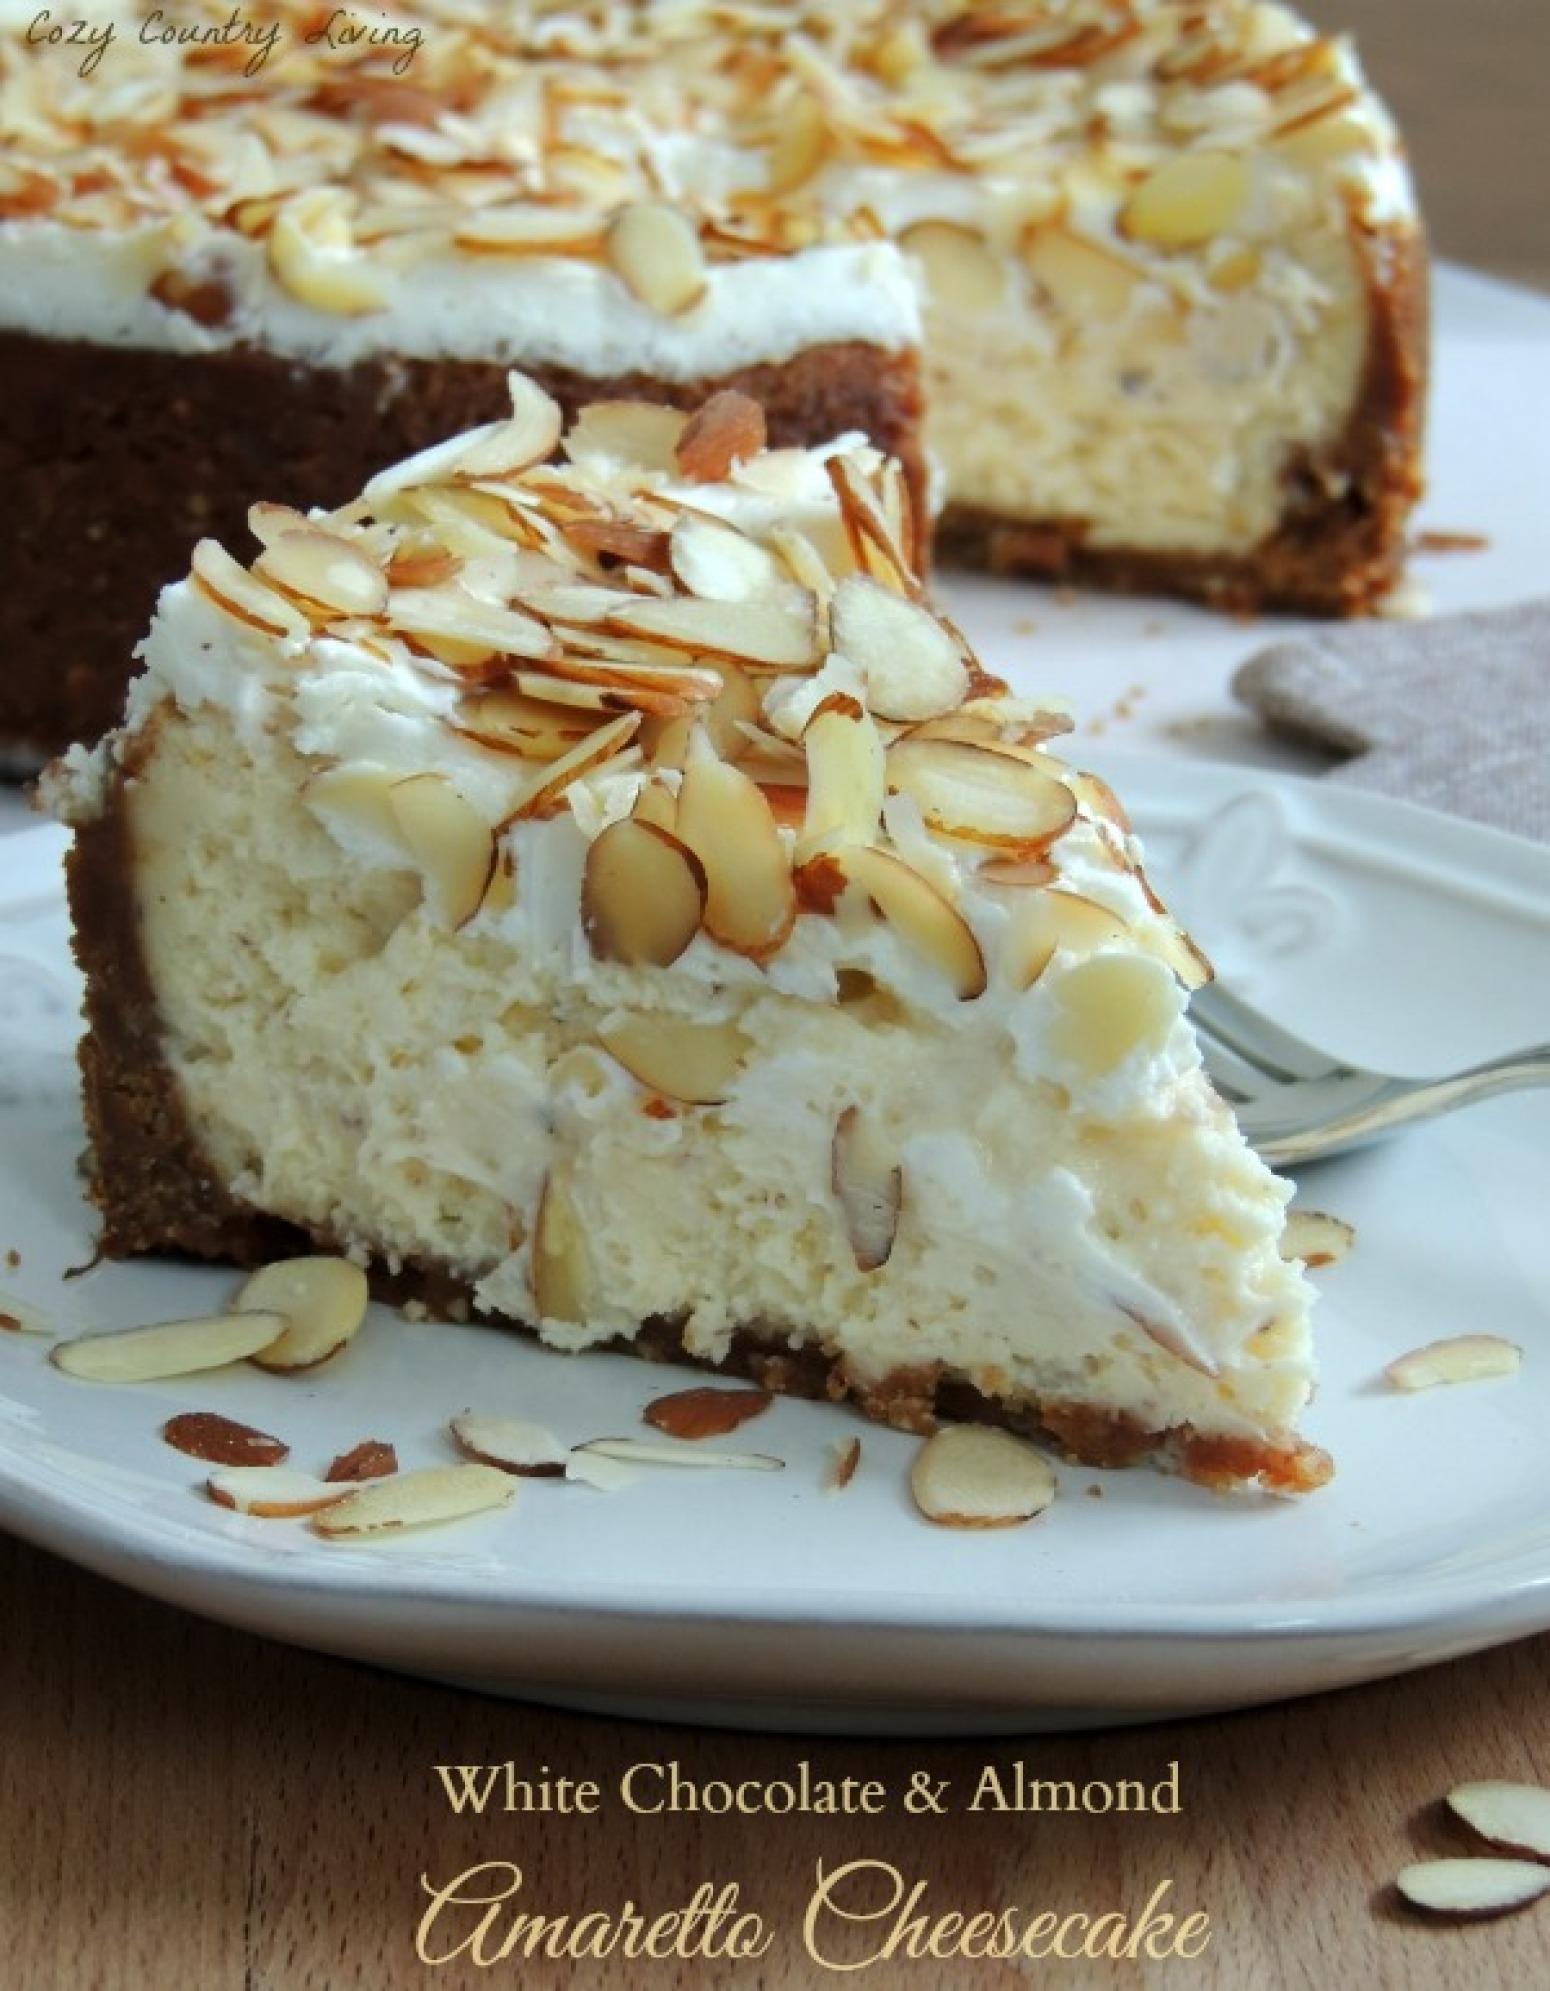 White Chocolate & Almond Amaretto Cheesecake Recipe | Just A Pinch ...